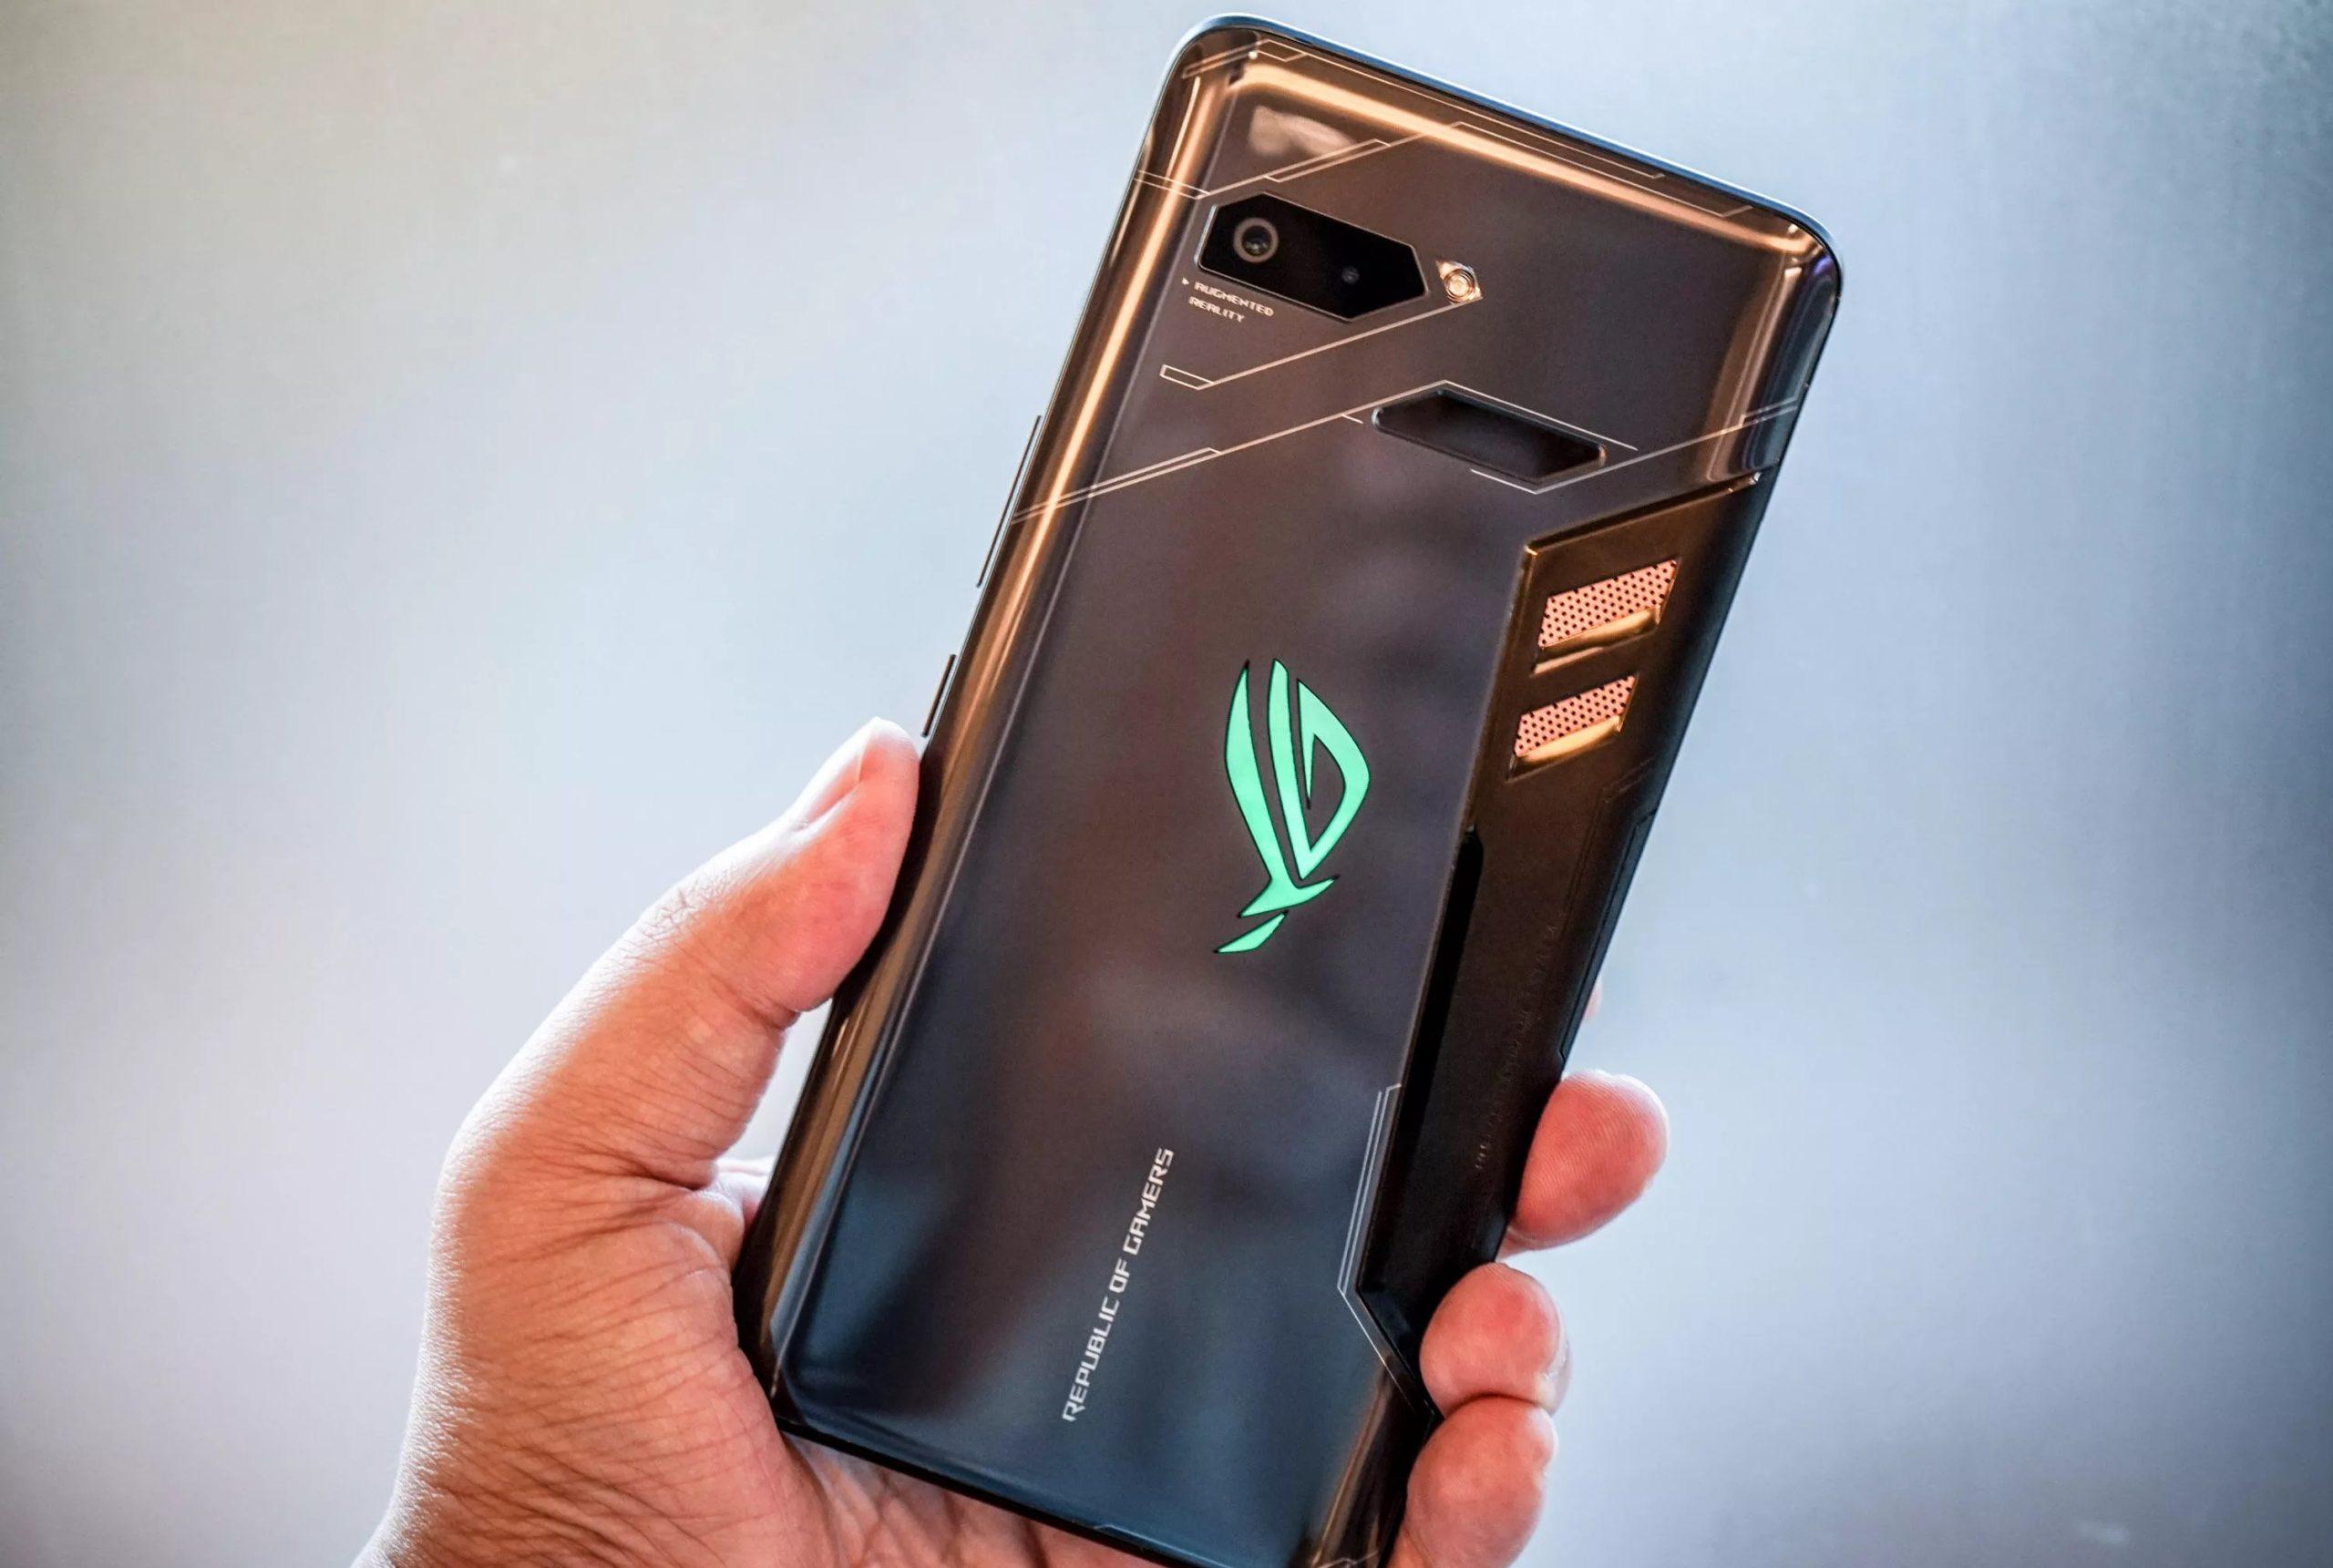 Asus ROG Phone: valida alternativa